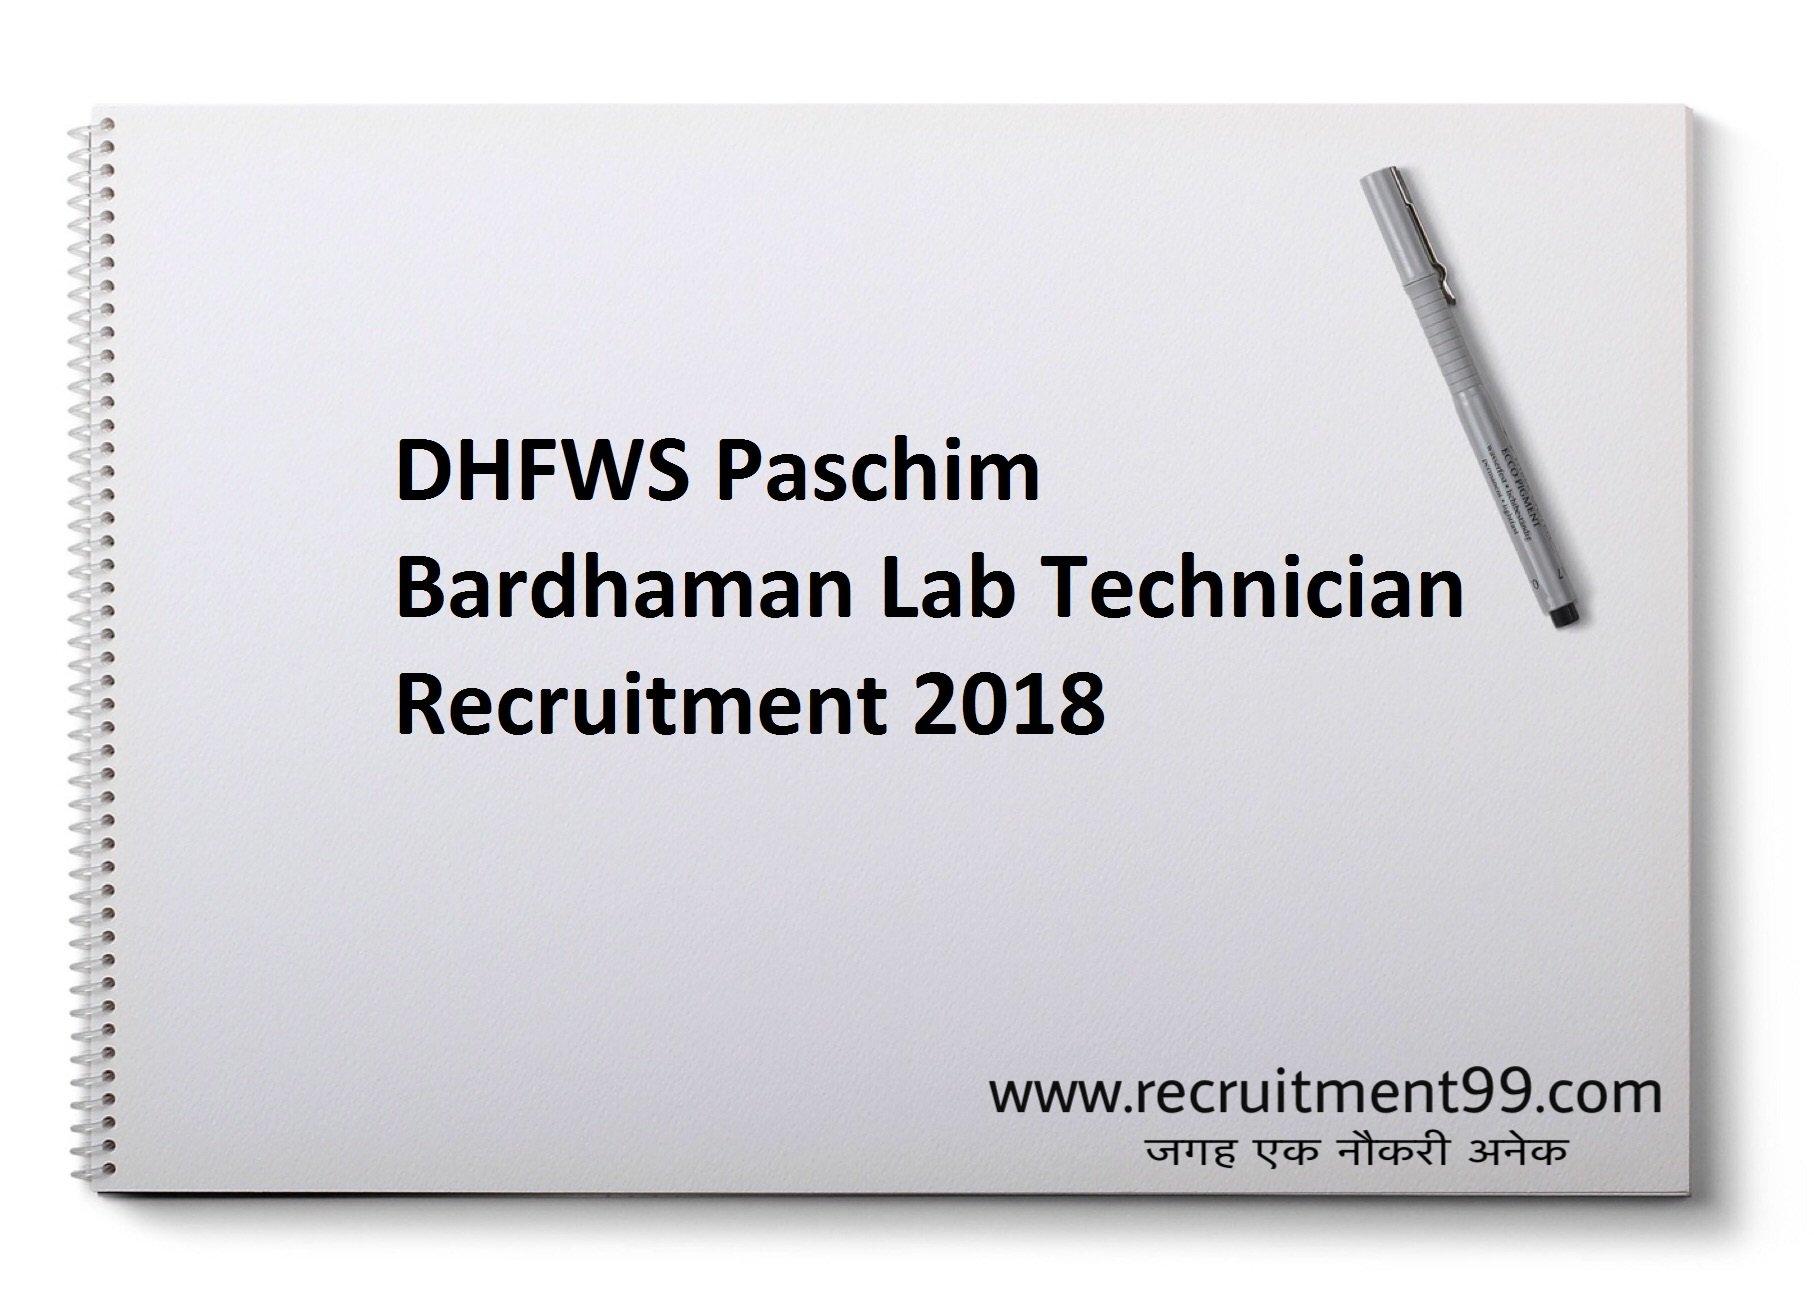 DHFWS Paschim Bardhaman Recruitment Lab Technician Admit Card Result 2018